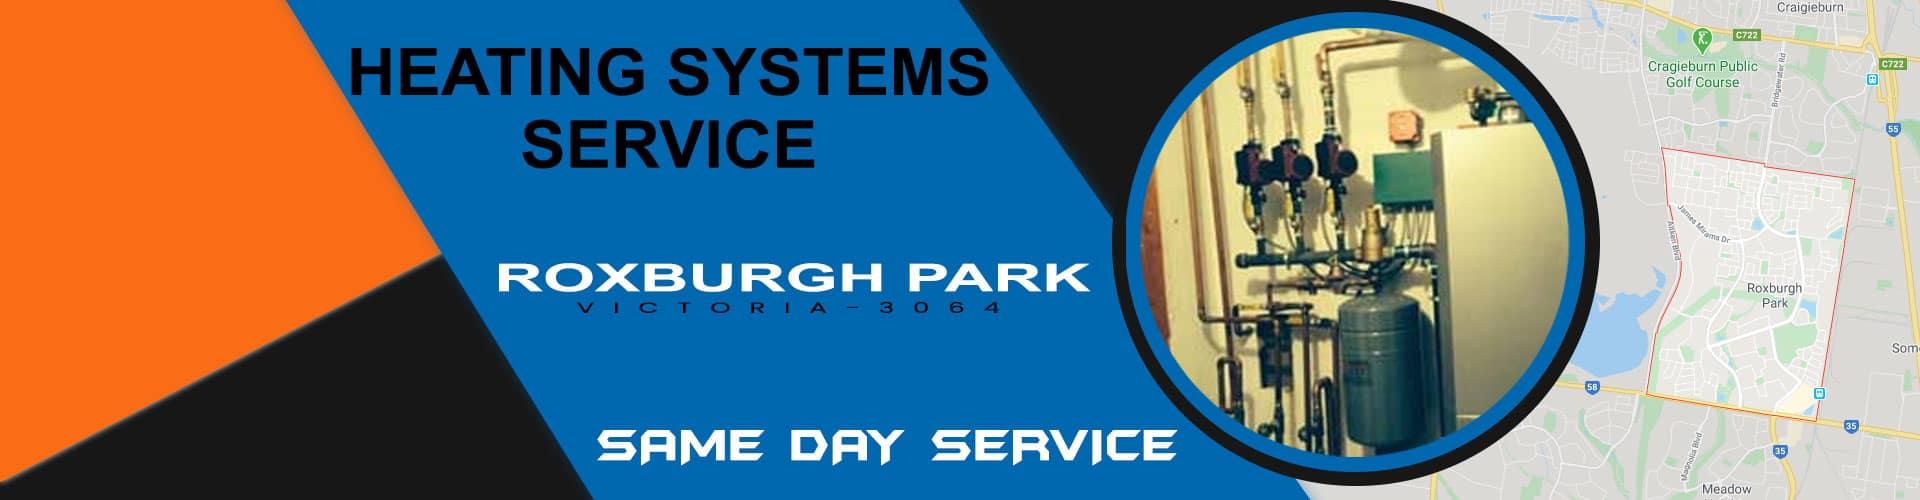 Heating Systems Roxburgh Park